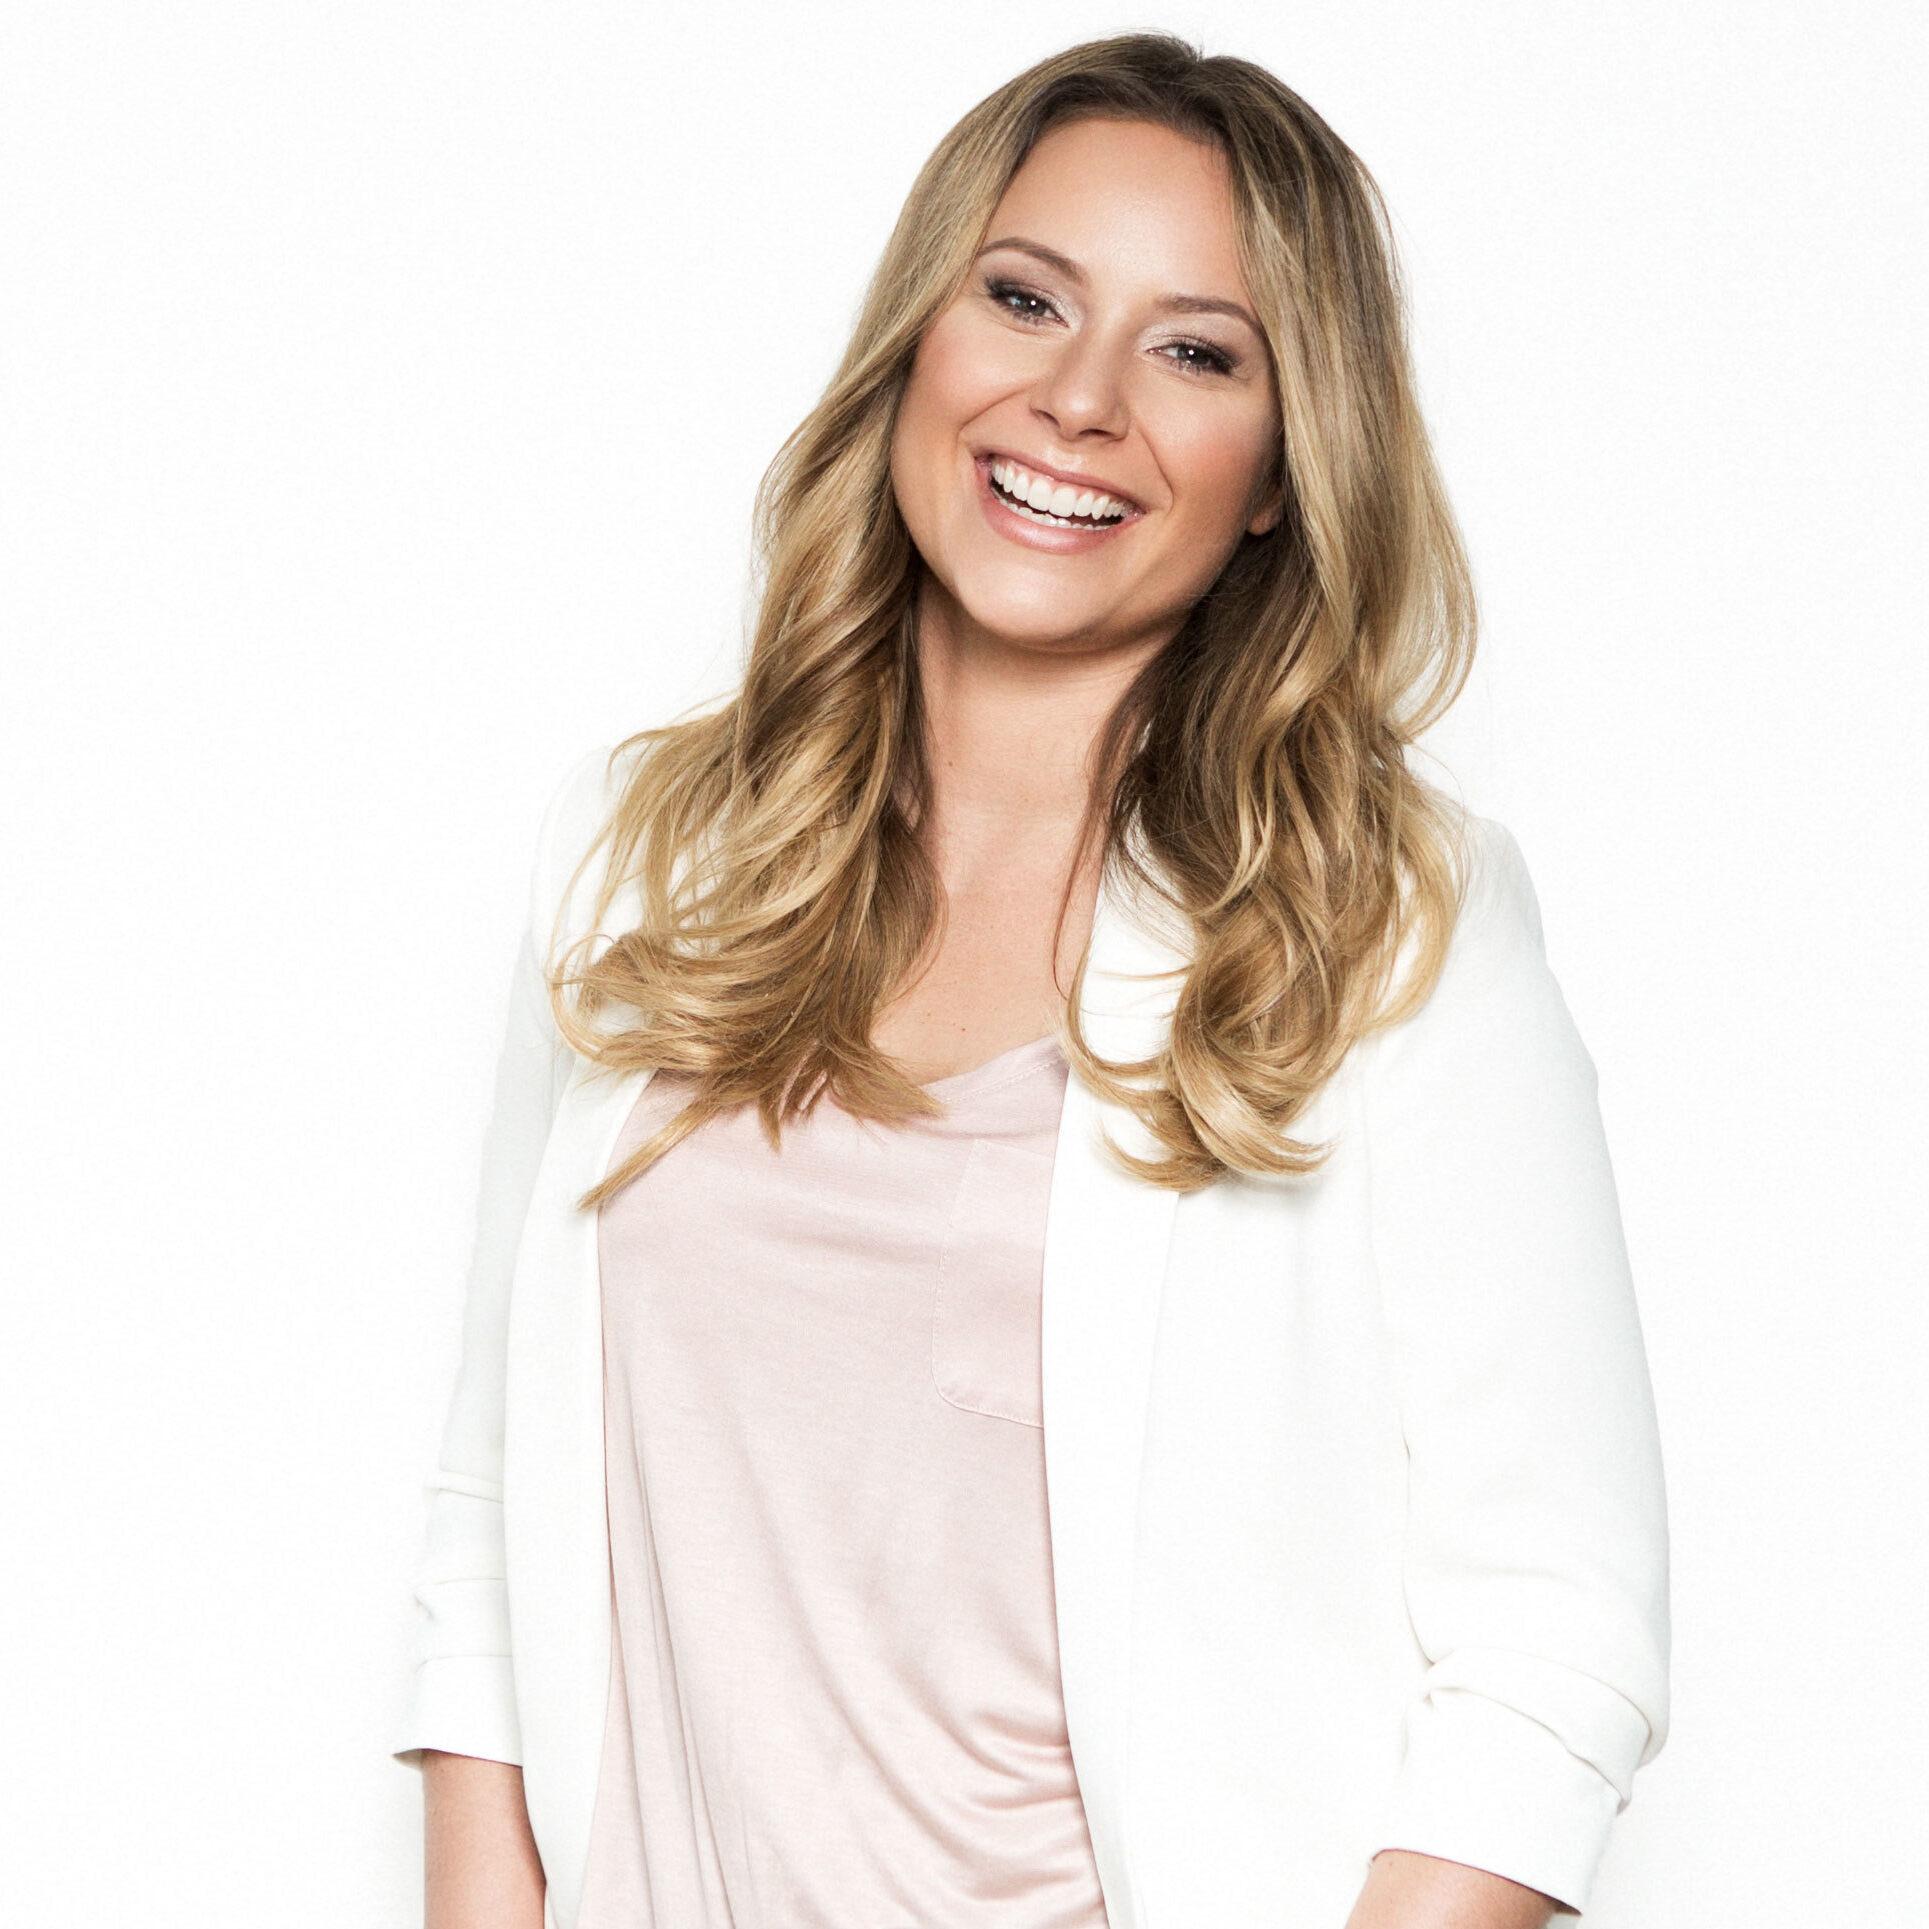 Lebenslauf Saskia Naumann Moderatorin Für Event Tv